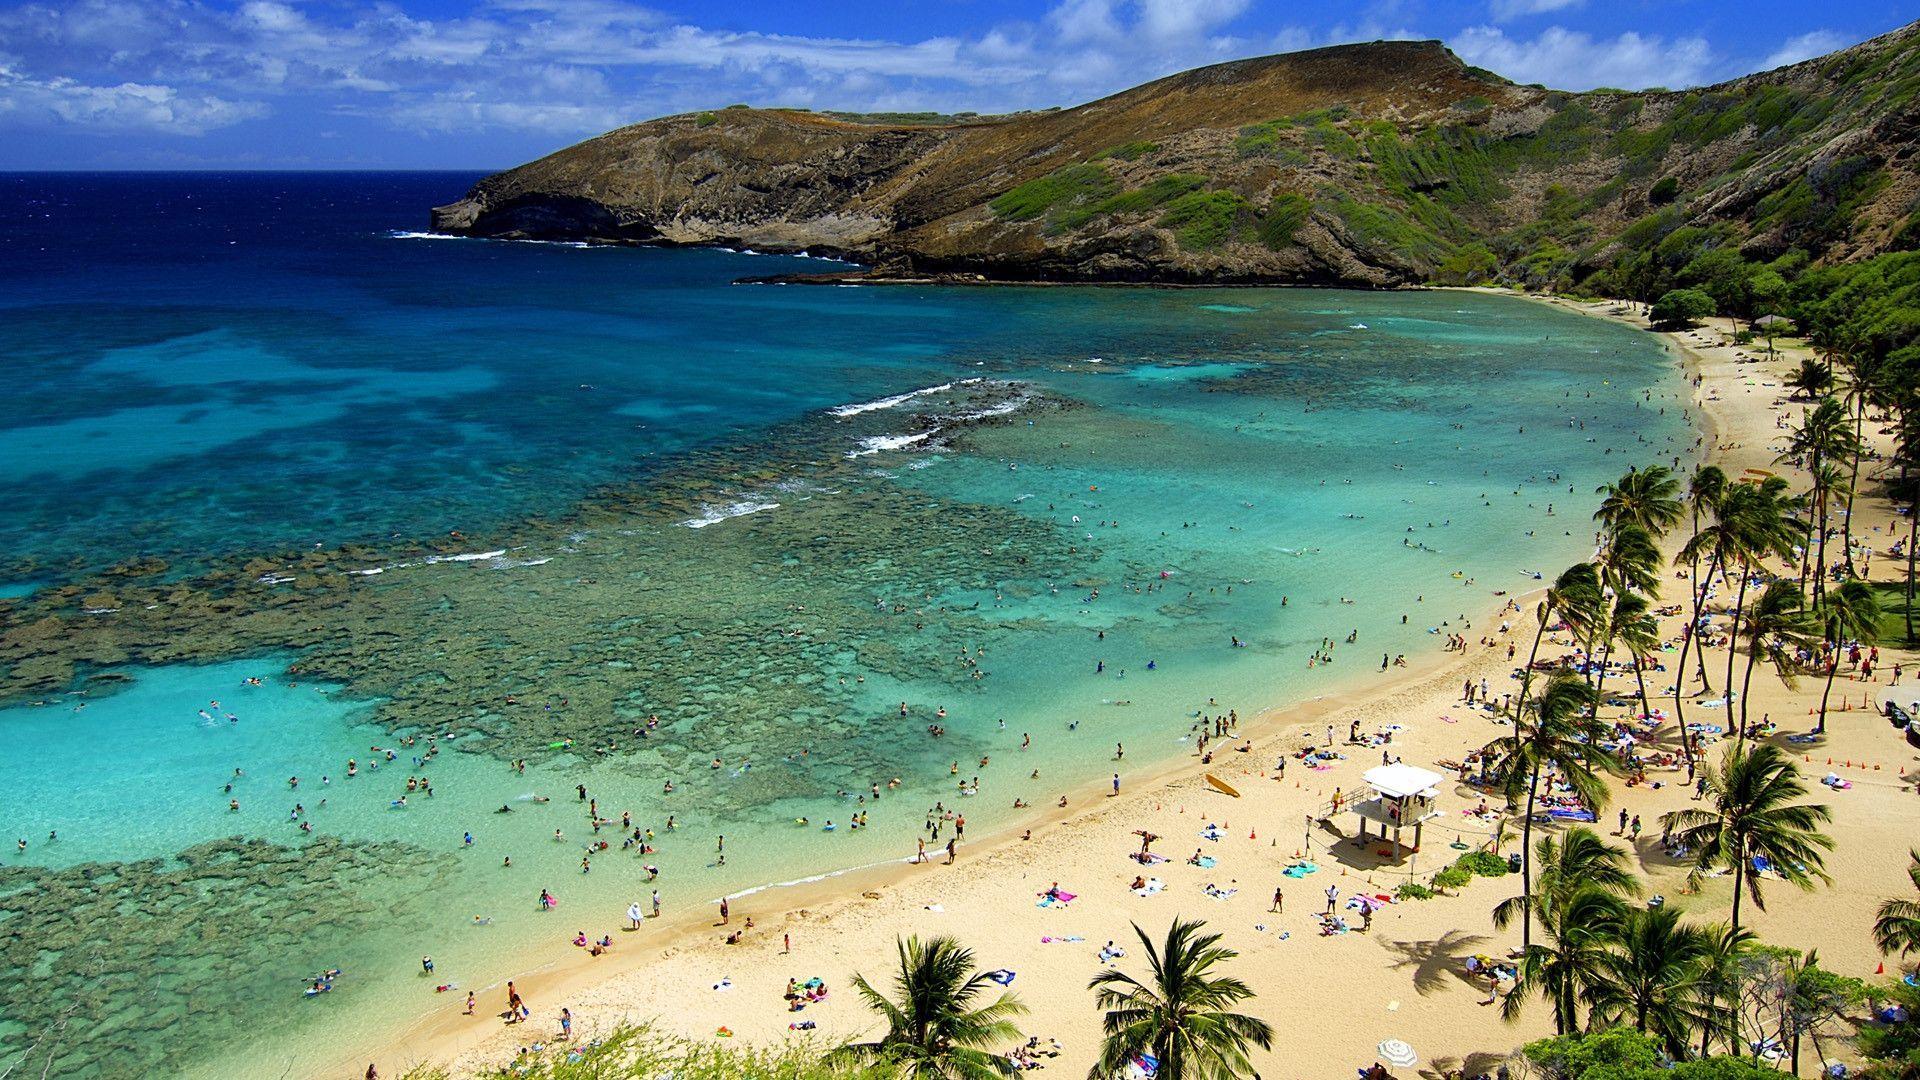 Free Hawaii Wallpapers - Wallpaper Cave